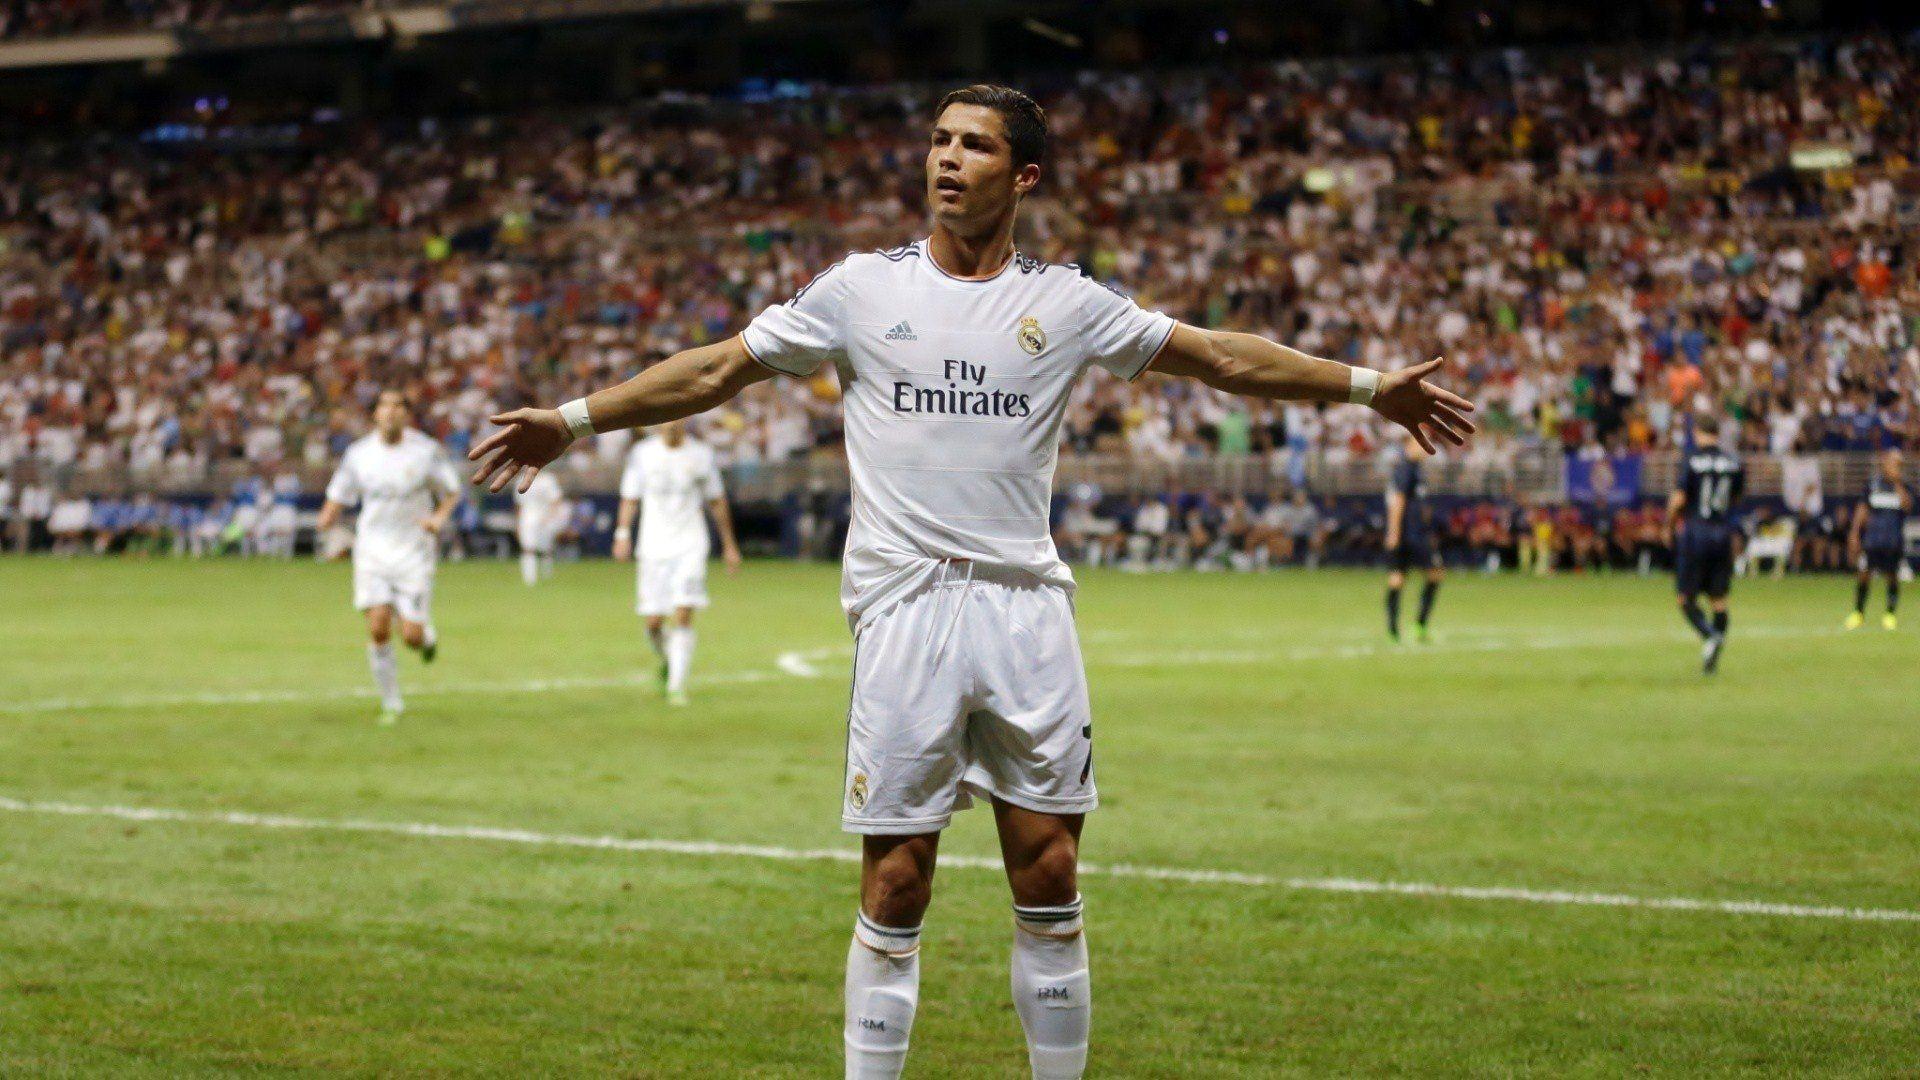 Ronaldo Hd Wallpapers For Mobile Wallpaper Cave